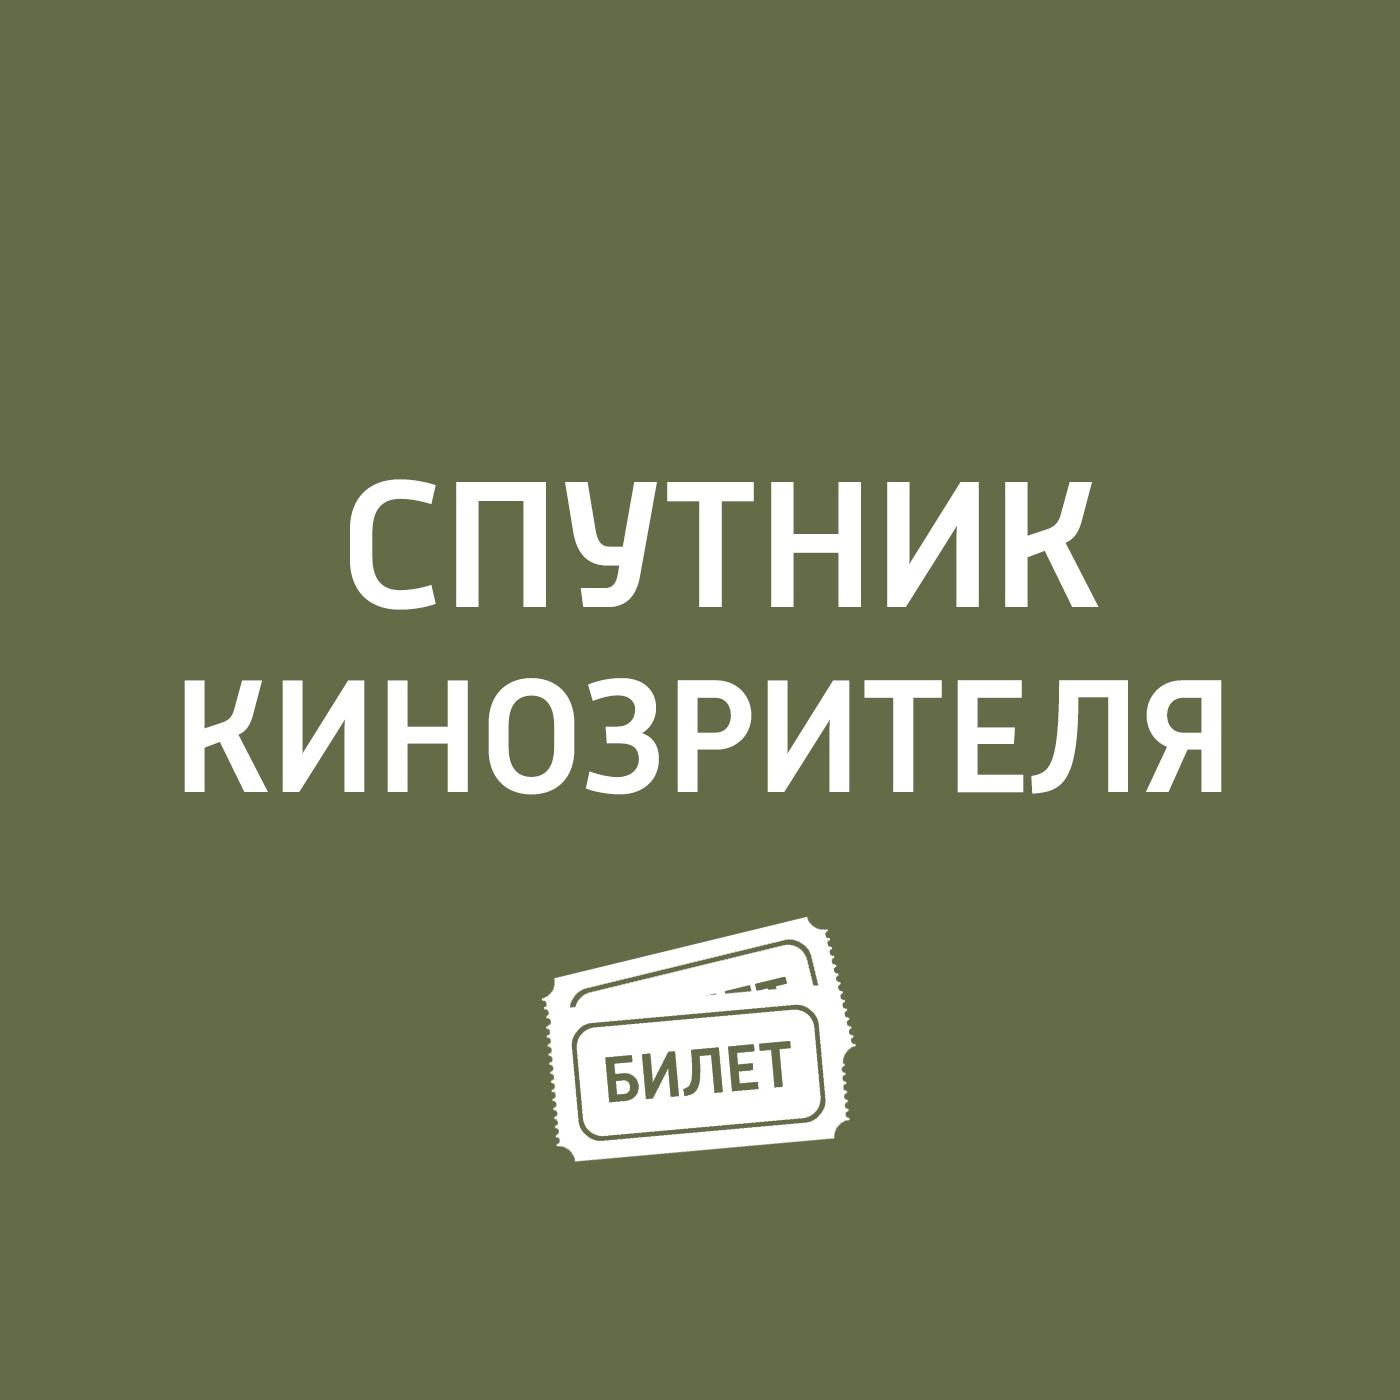 Антон Долин Мартин Скорсезе антон мартин пути успеха